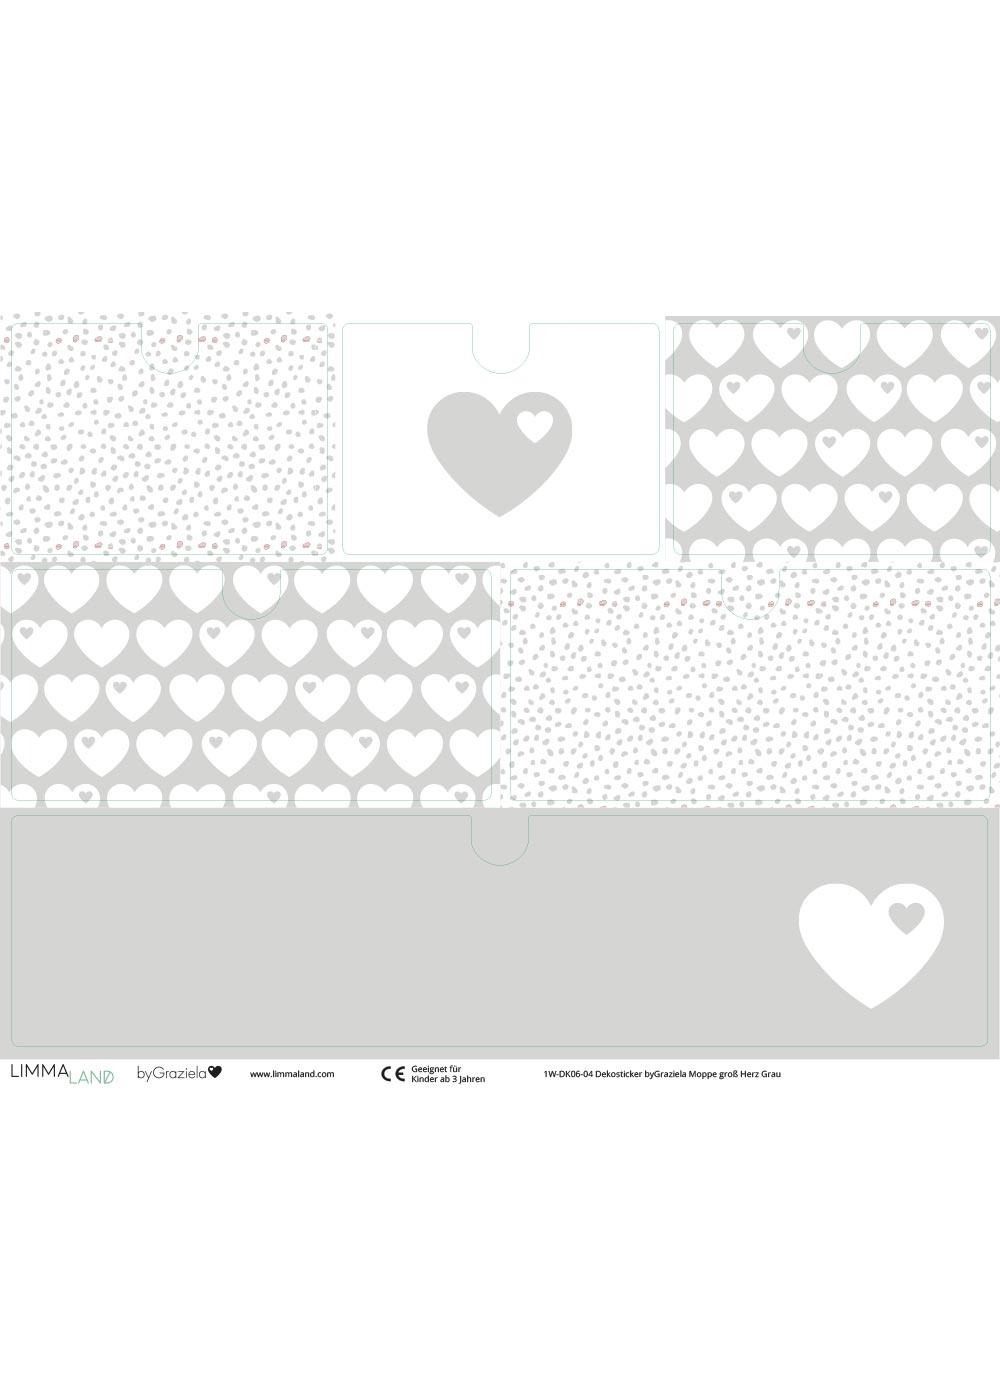 Klebefolie Ikea Moppe ByGraziela grau Herz Druckvorlage